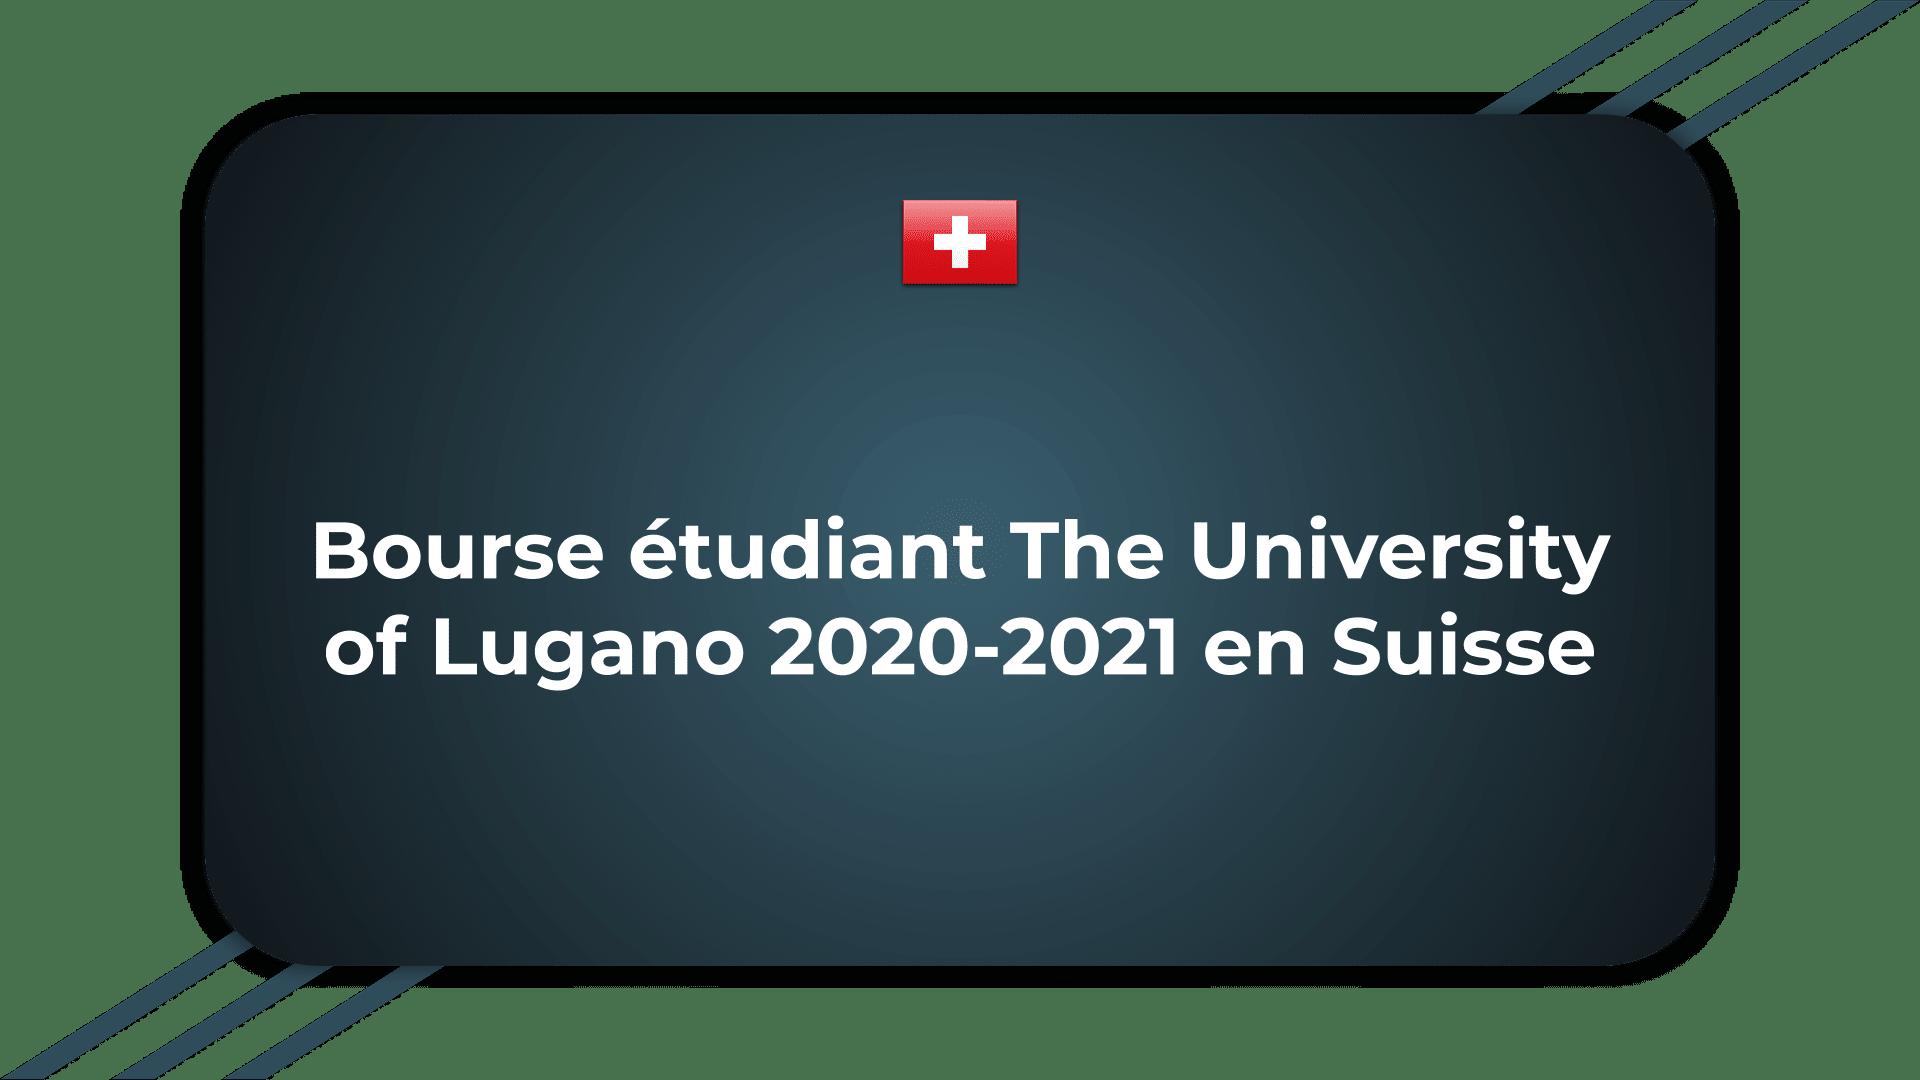 Bourse étudiant The University of Lugano